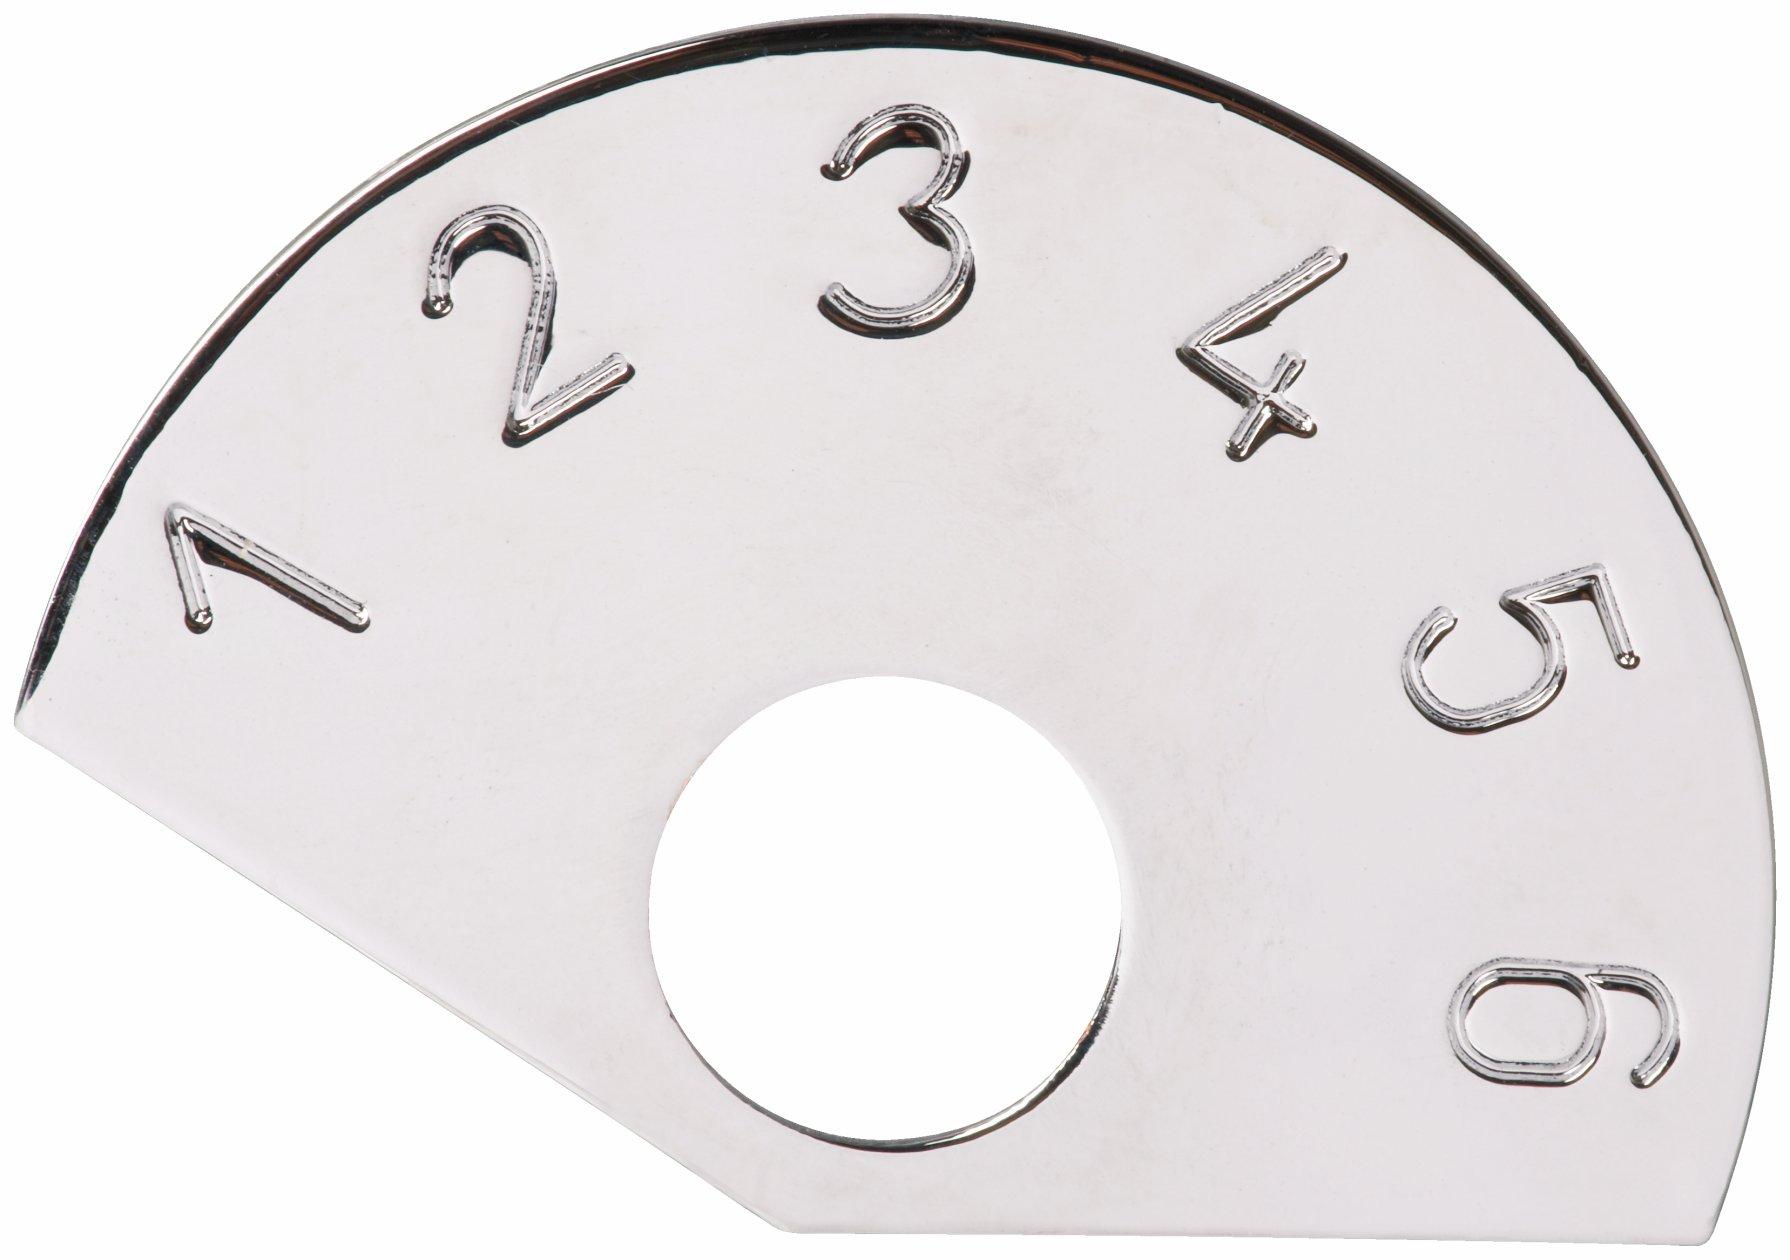 Framus Vintage Parts - 6-Position Control Plate, Silver